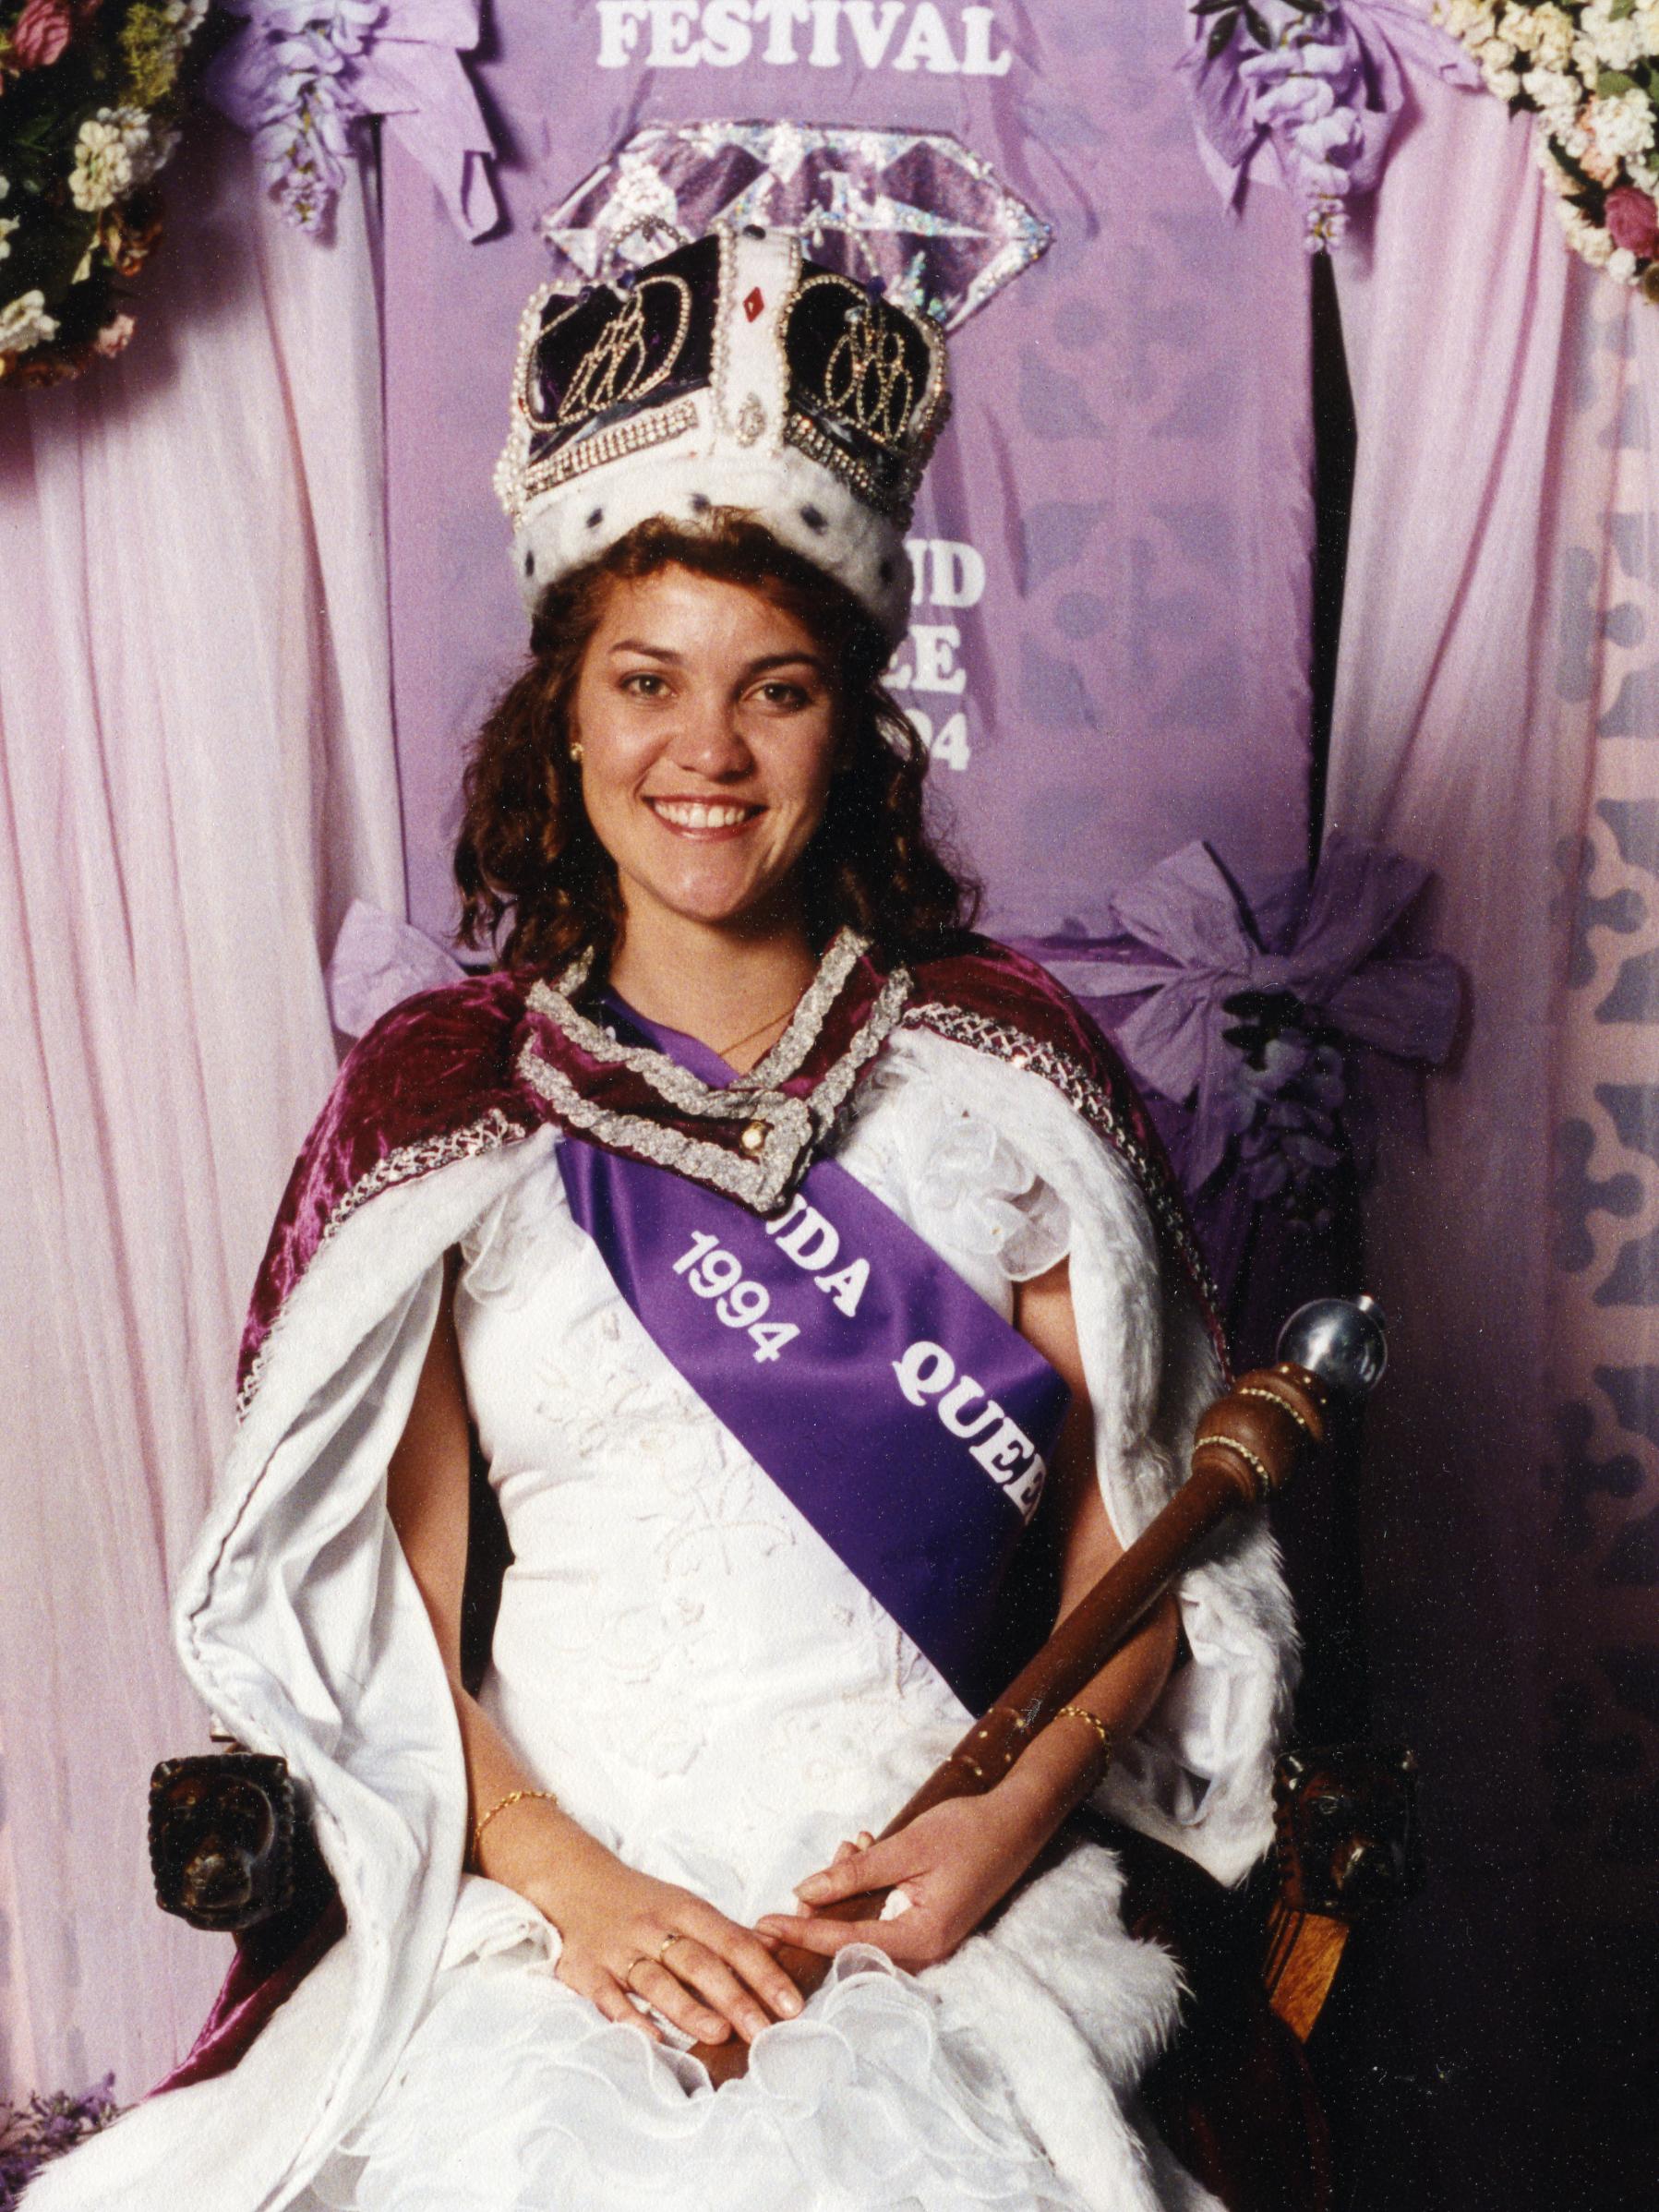 Melissa Boman